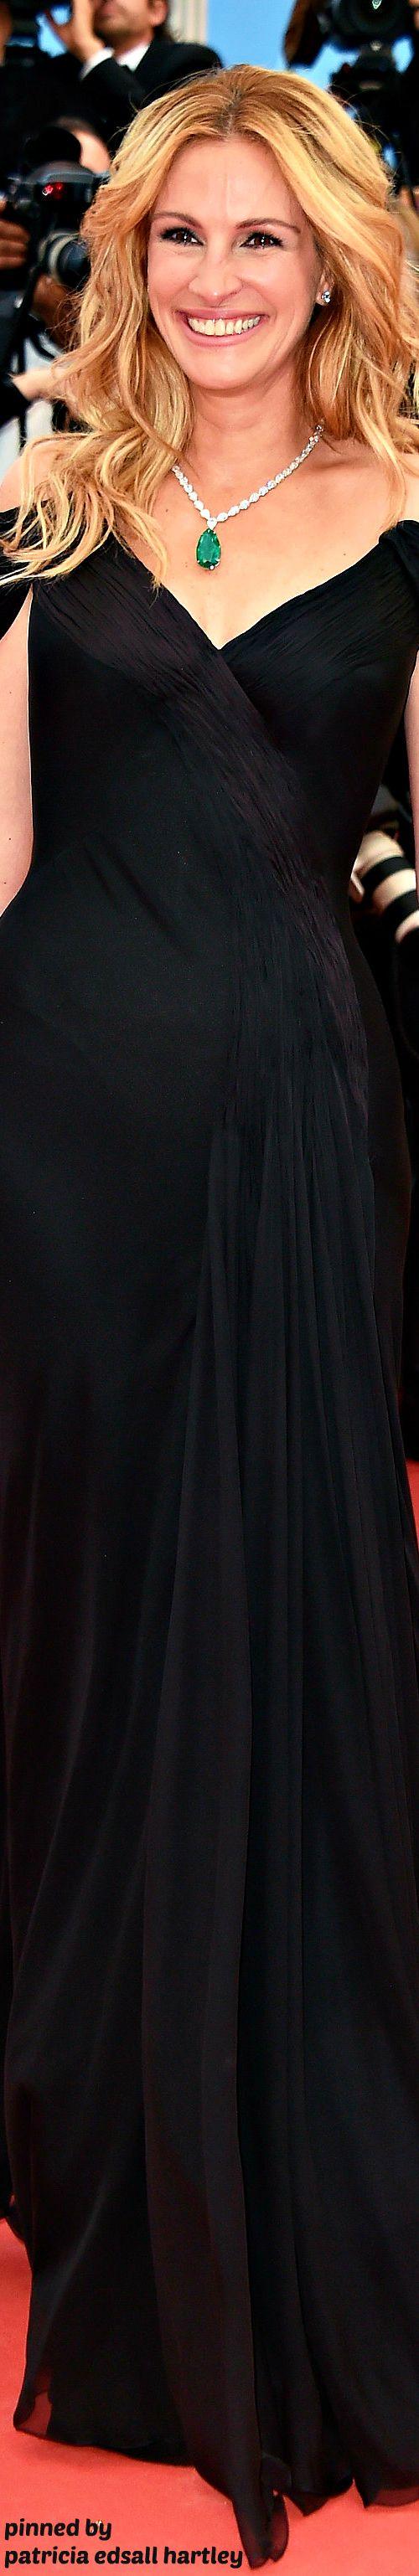 Julia Roberts - 2016 Cannes Film Festival